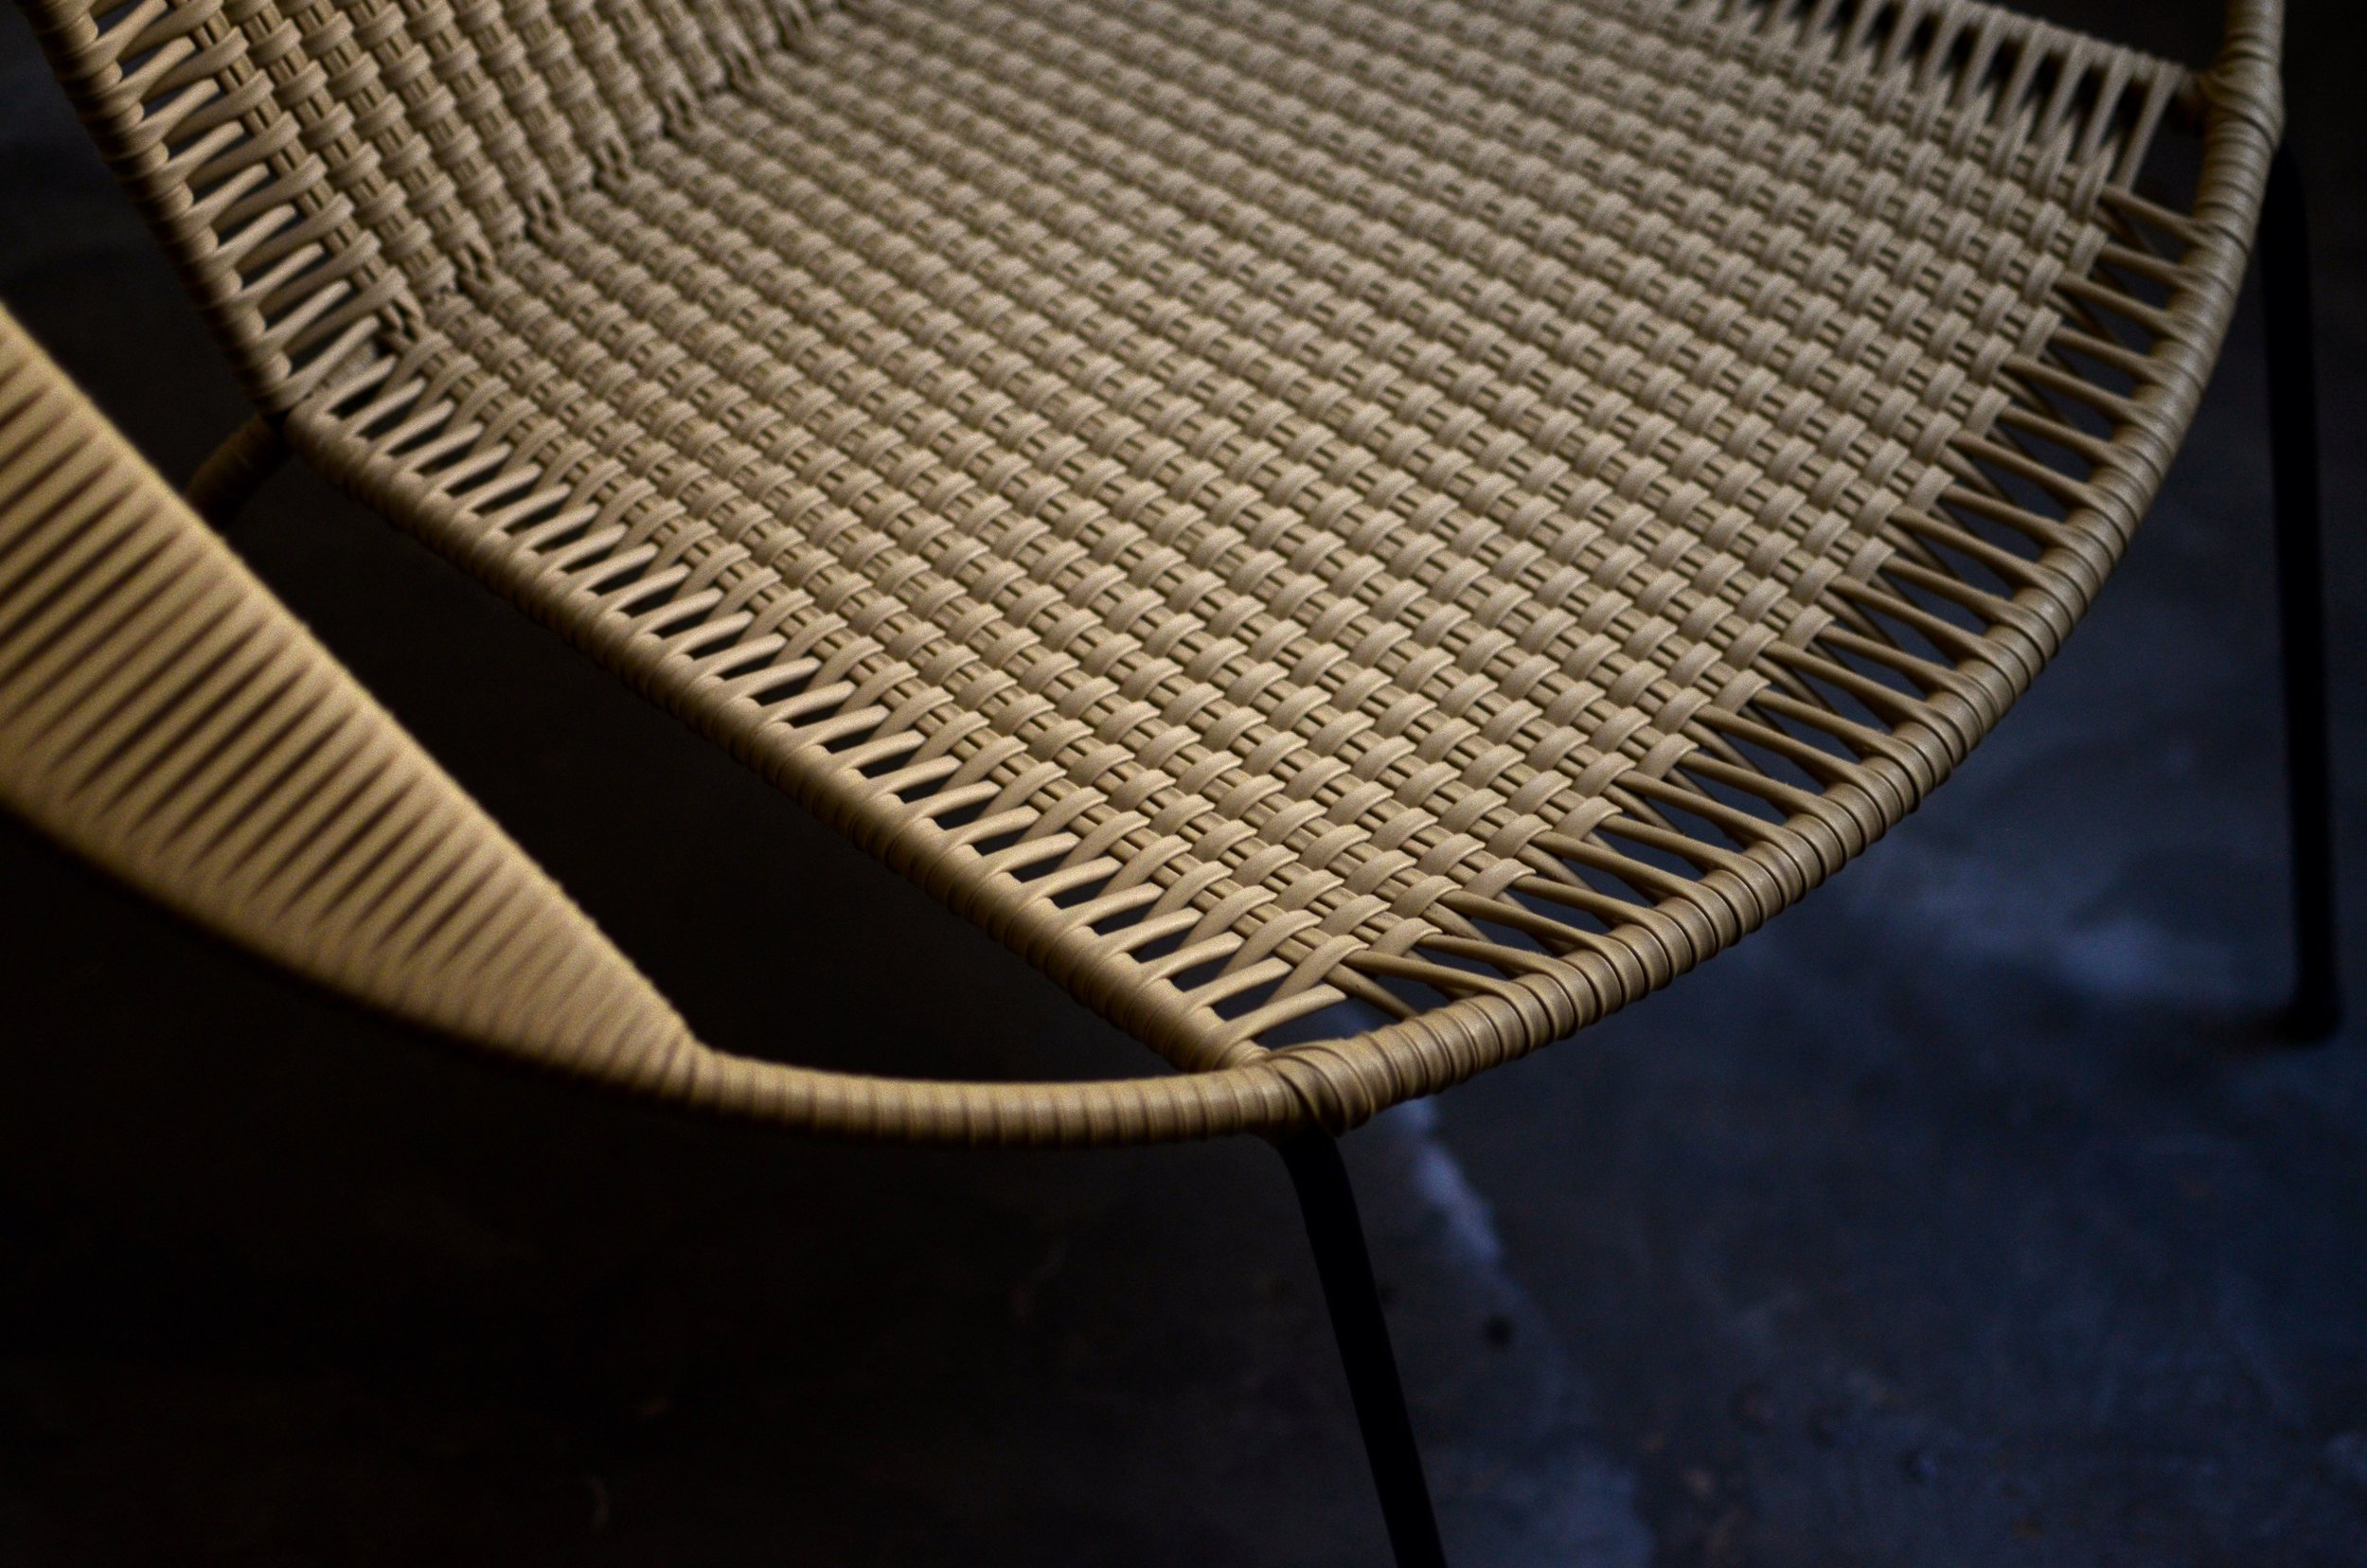 Tucurinca classic easy chair 4.jpg